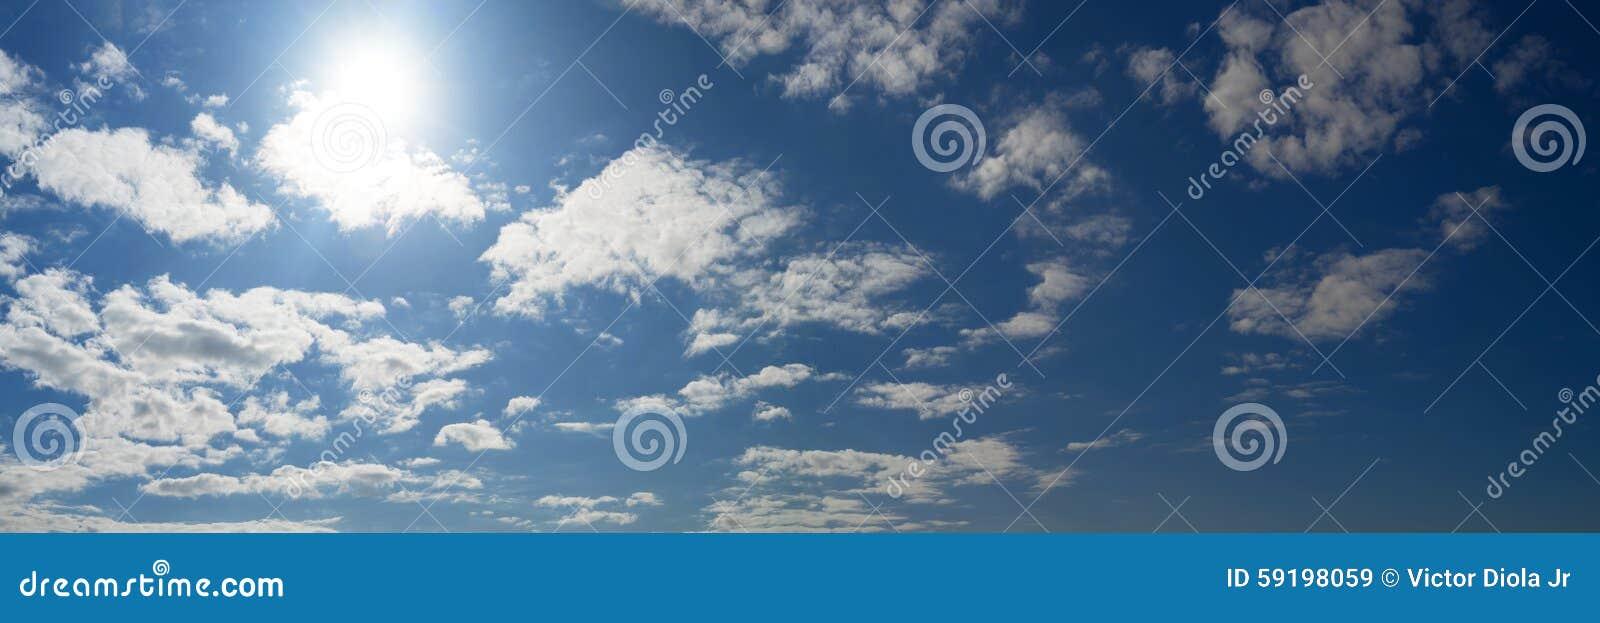 Cloudy Blue Sky Panorama Stock Photo - Image: 59198059